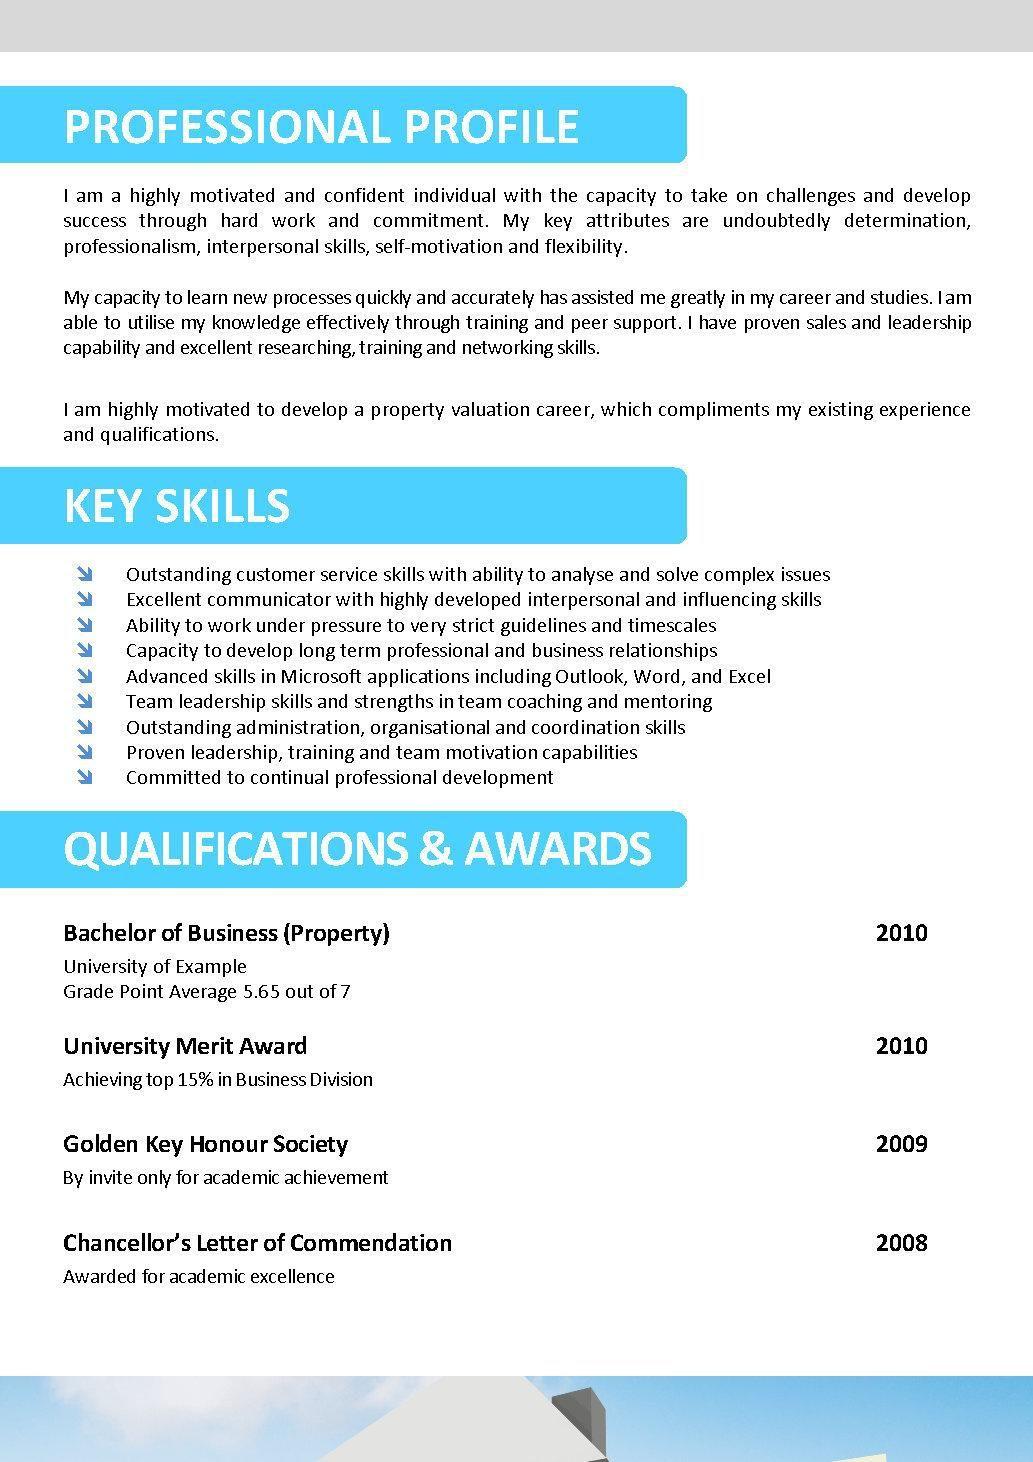 002 Unusual Free Printable Resume Template Australia High Definition Full